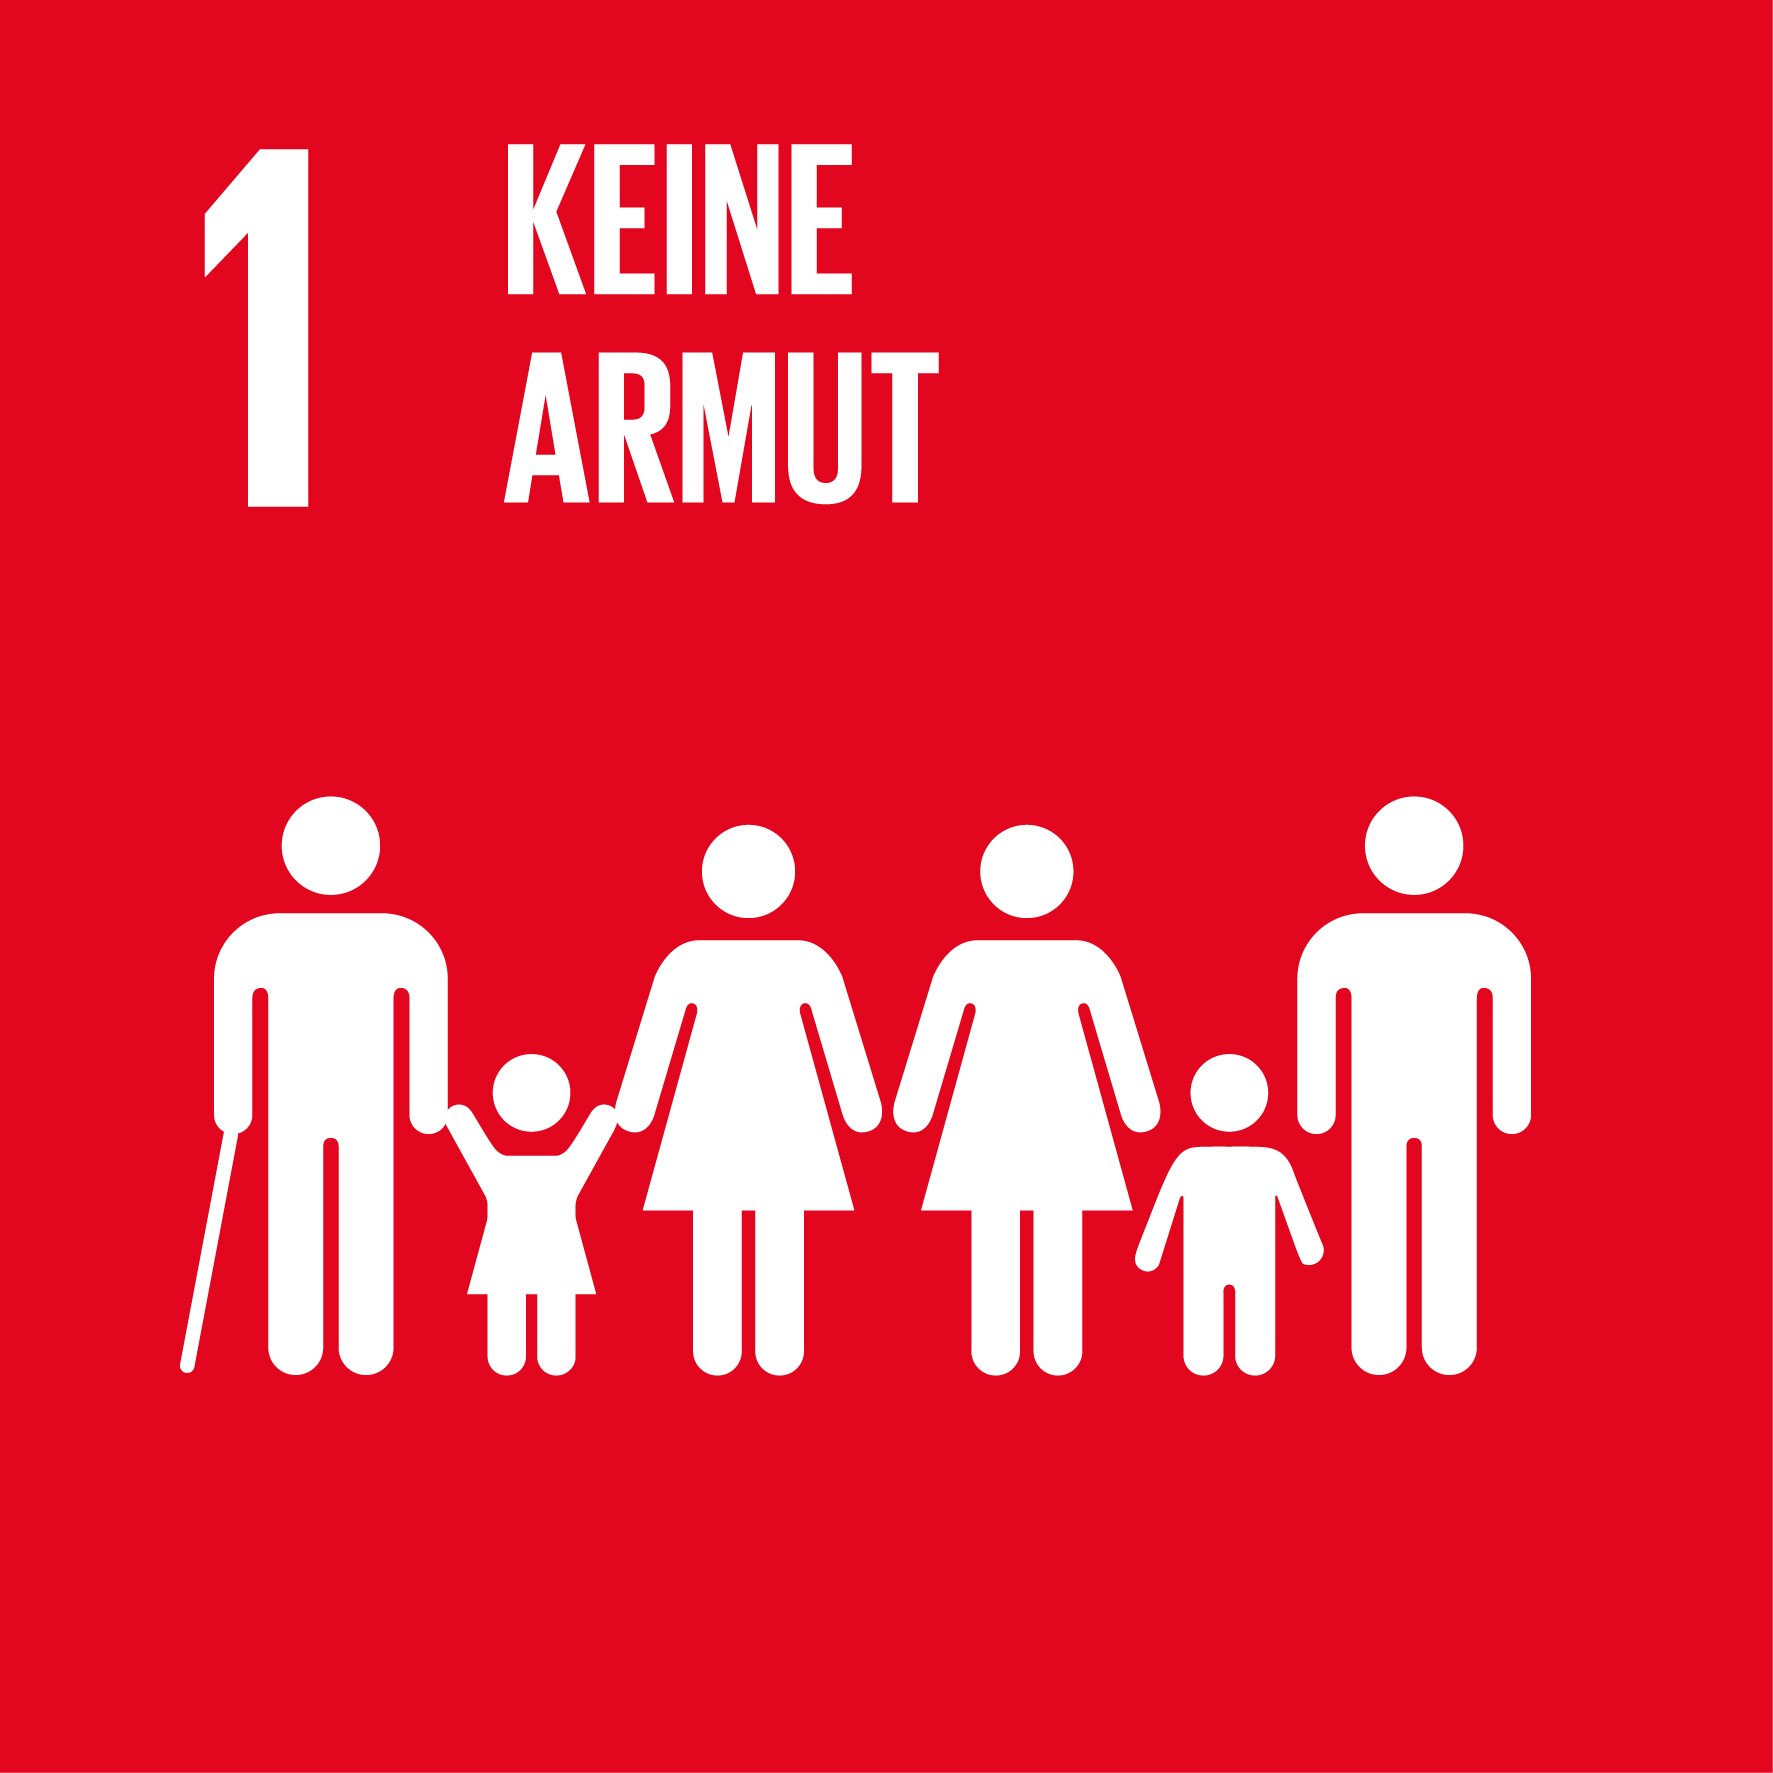 Regensburger Nachhaltigkeitswoche - SDG 1